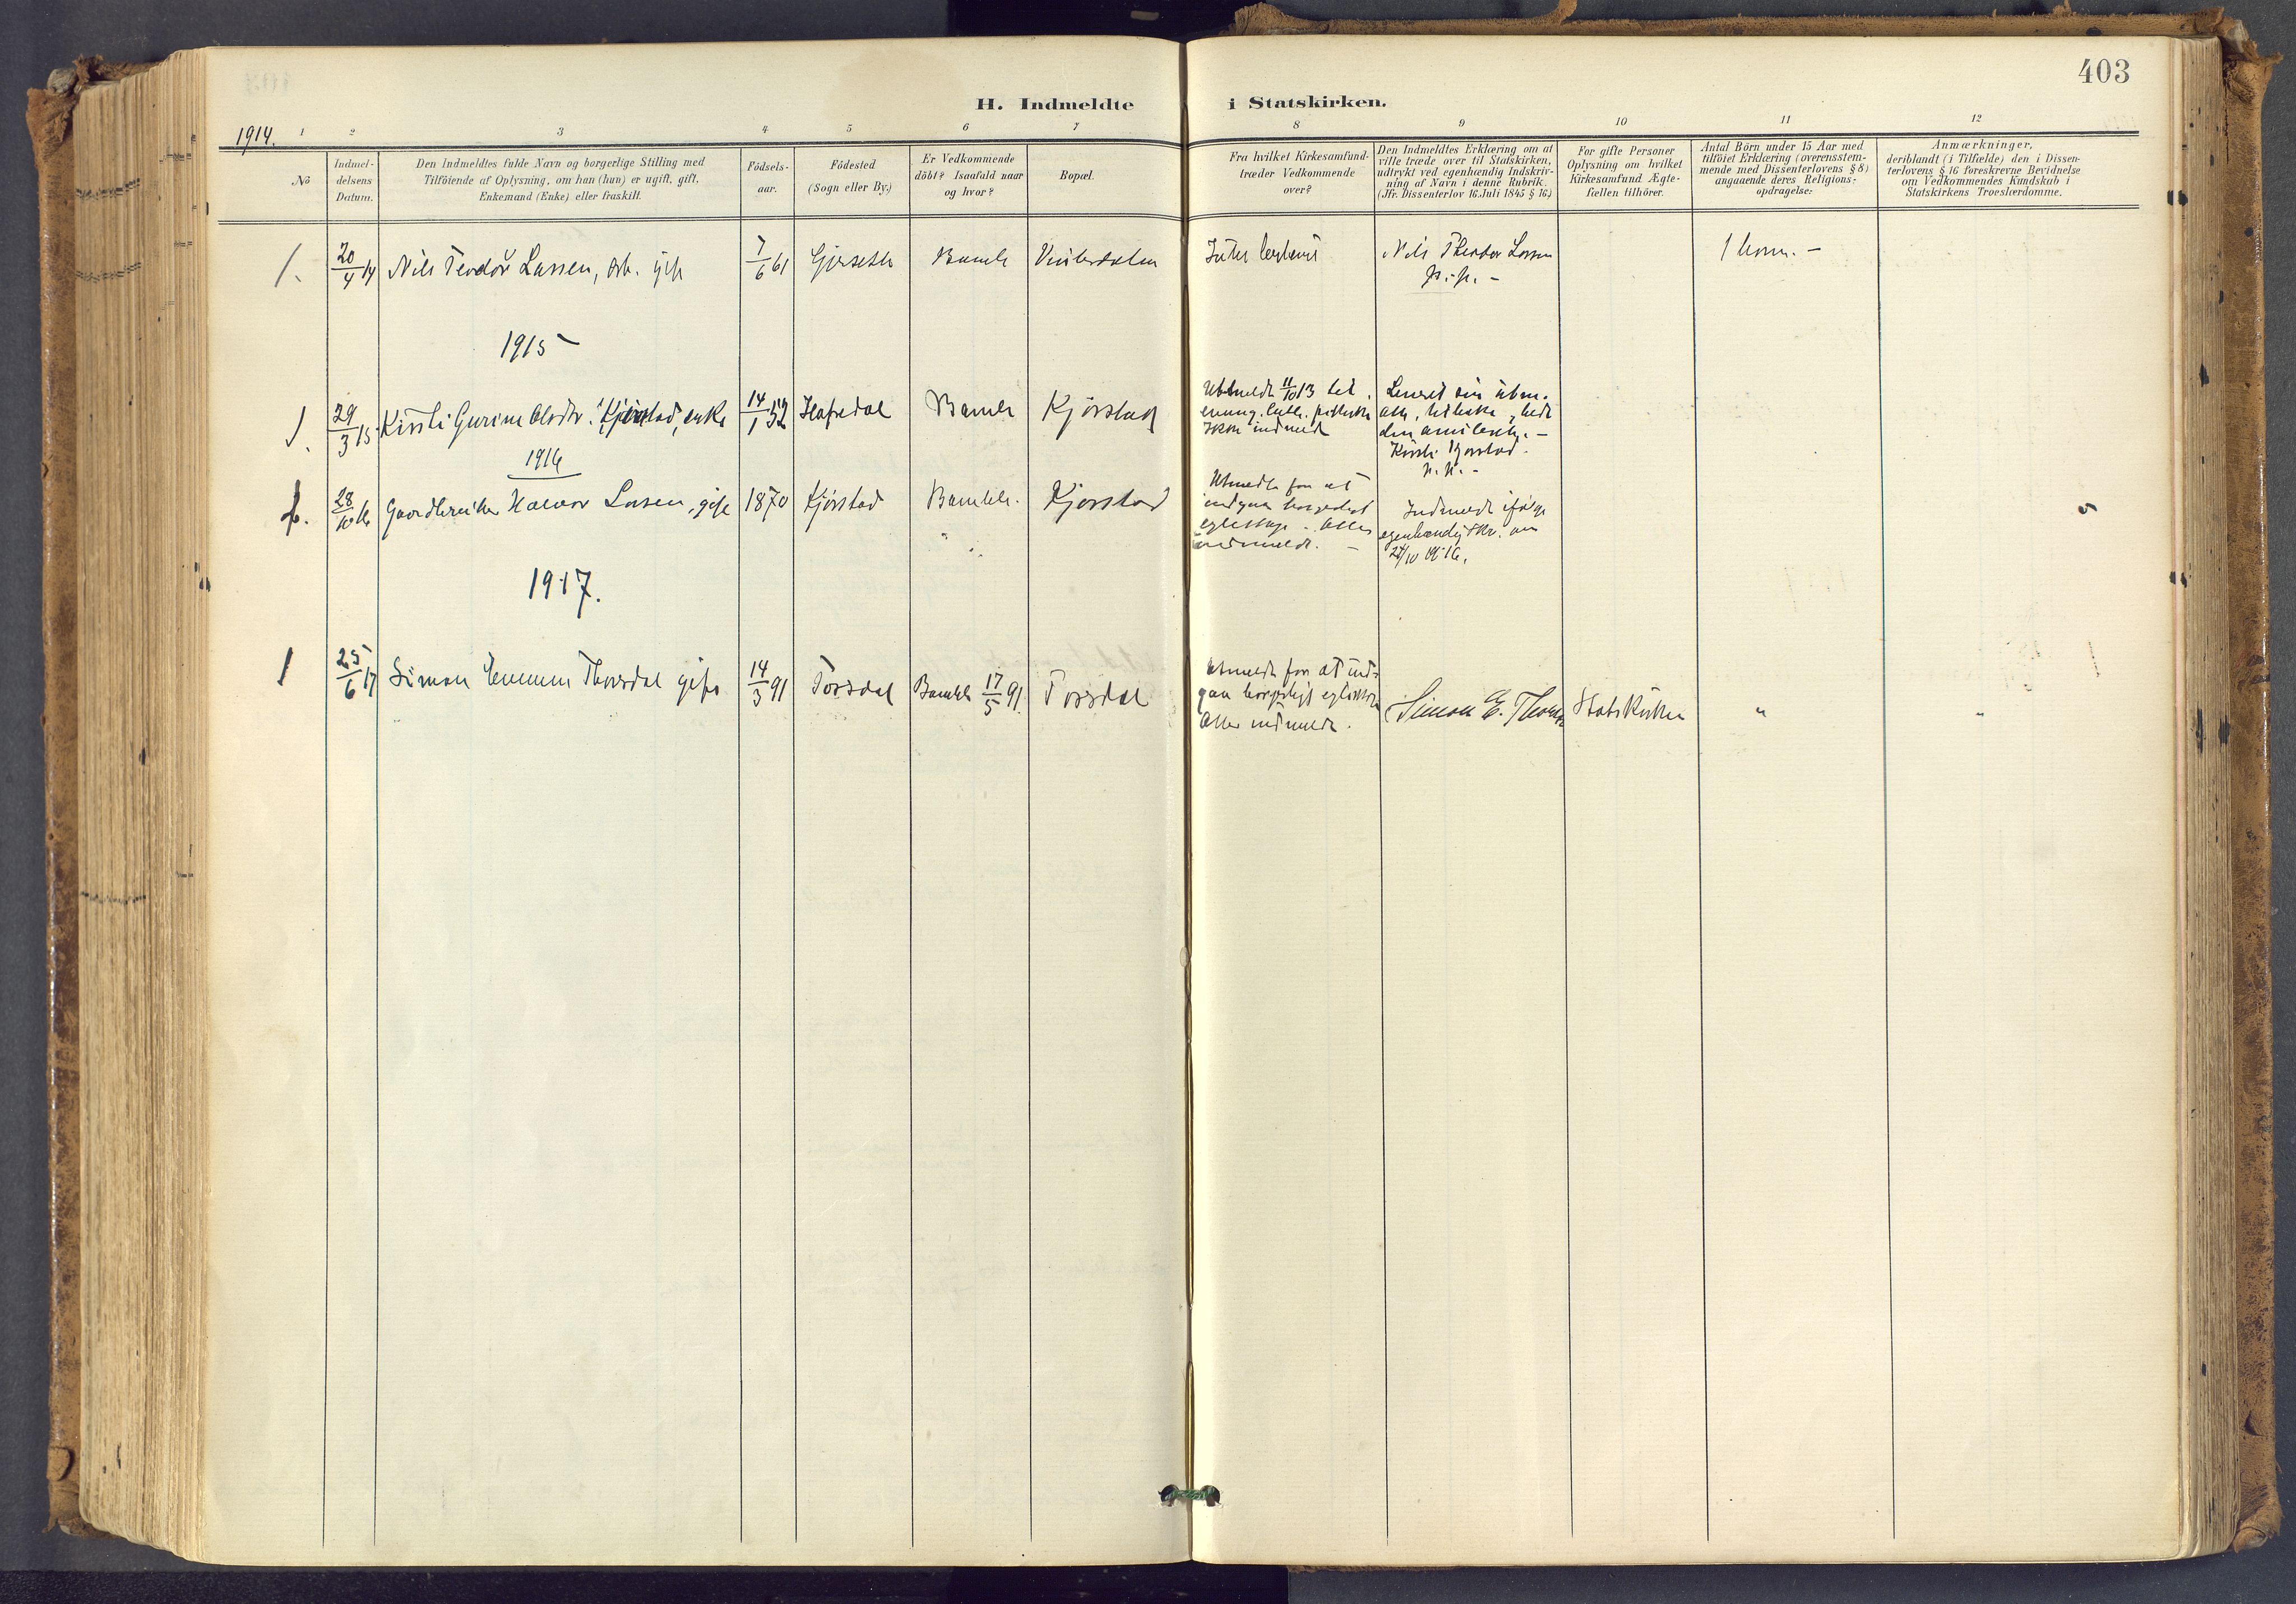 SAKO, Bamble kirkebøker, F/Fa/L0009: Ministerialbok nr. I 9, 1901-1917, s. 403